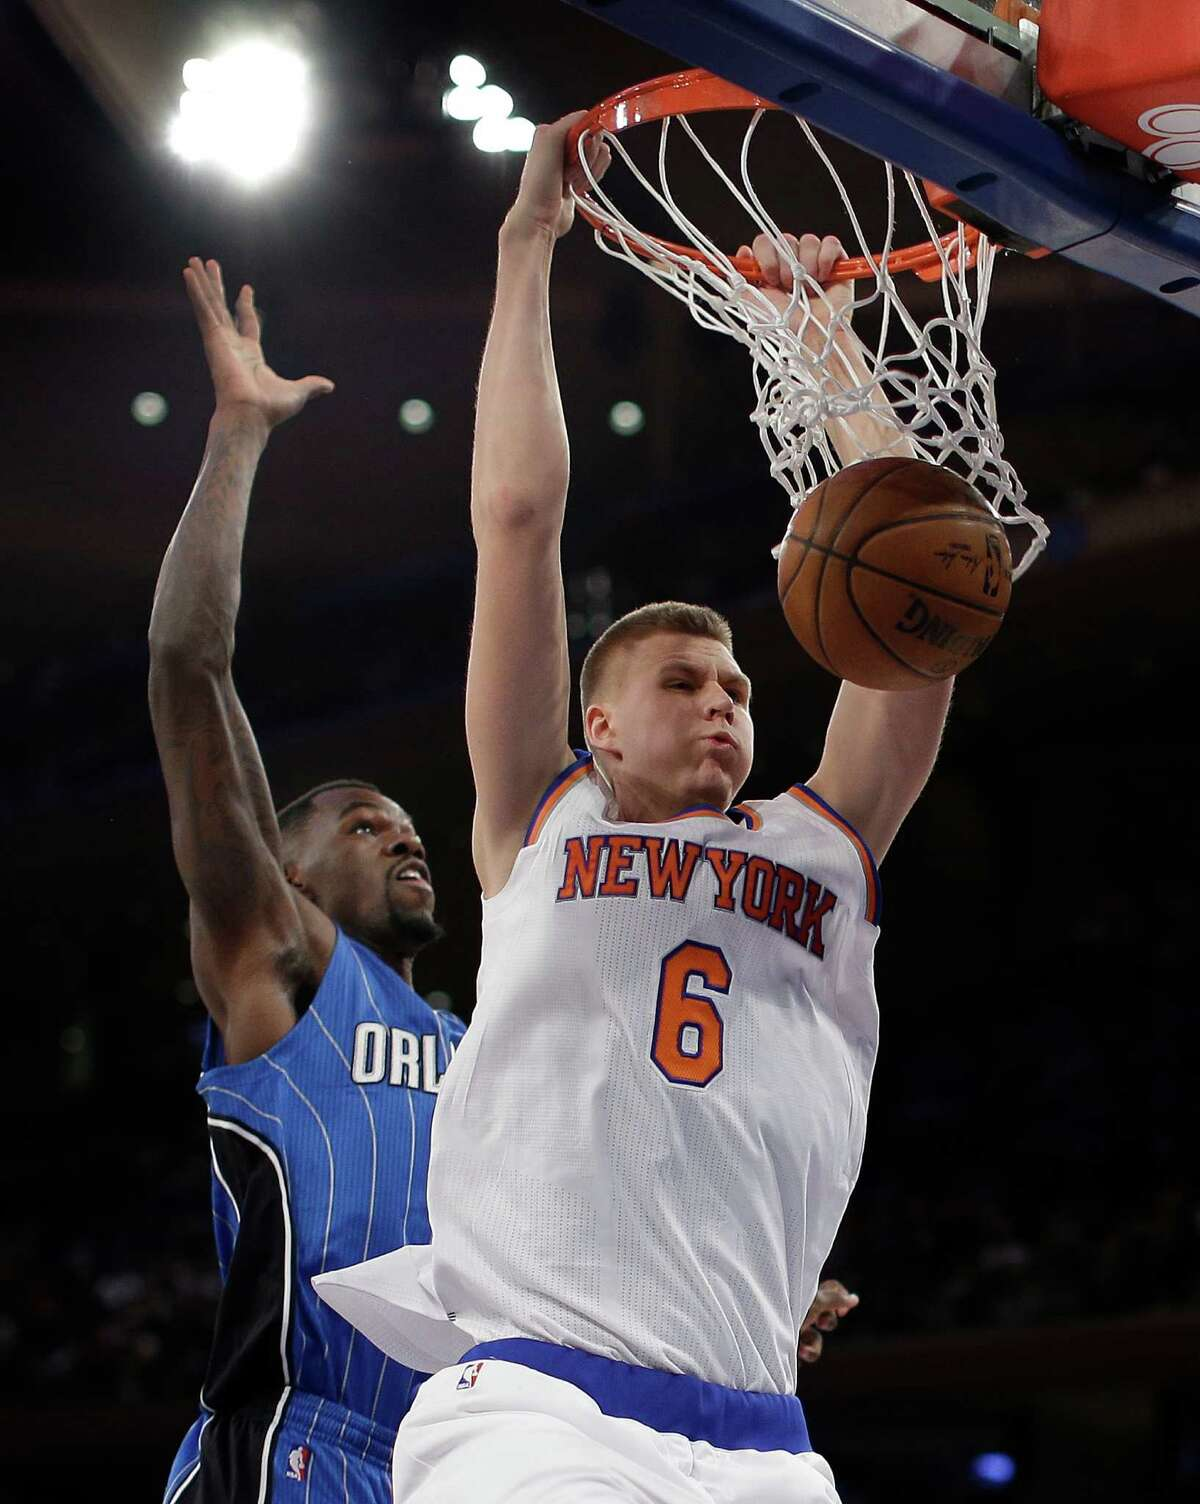 New York Knicks forward Kristaps Porzingis (6) dunks against Orlando Magic center Dewayne Dedmon (3) during the fourth quarter of an NBA basketball game, Friday, Feb. 26, 2016, in New York. The Knicks won 108-95.(AP Photo/Julie Jacobson) ORG XMIT: NYJJ108